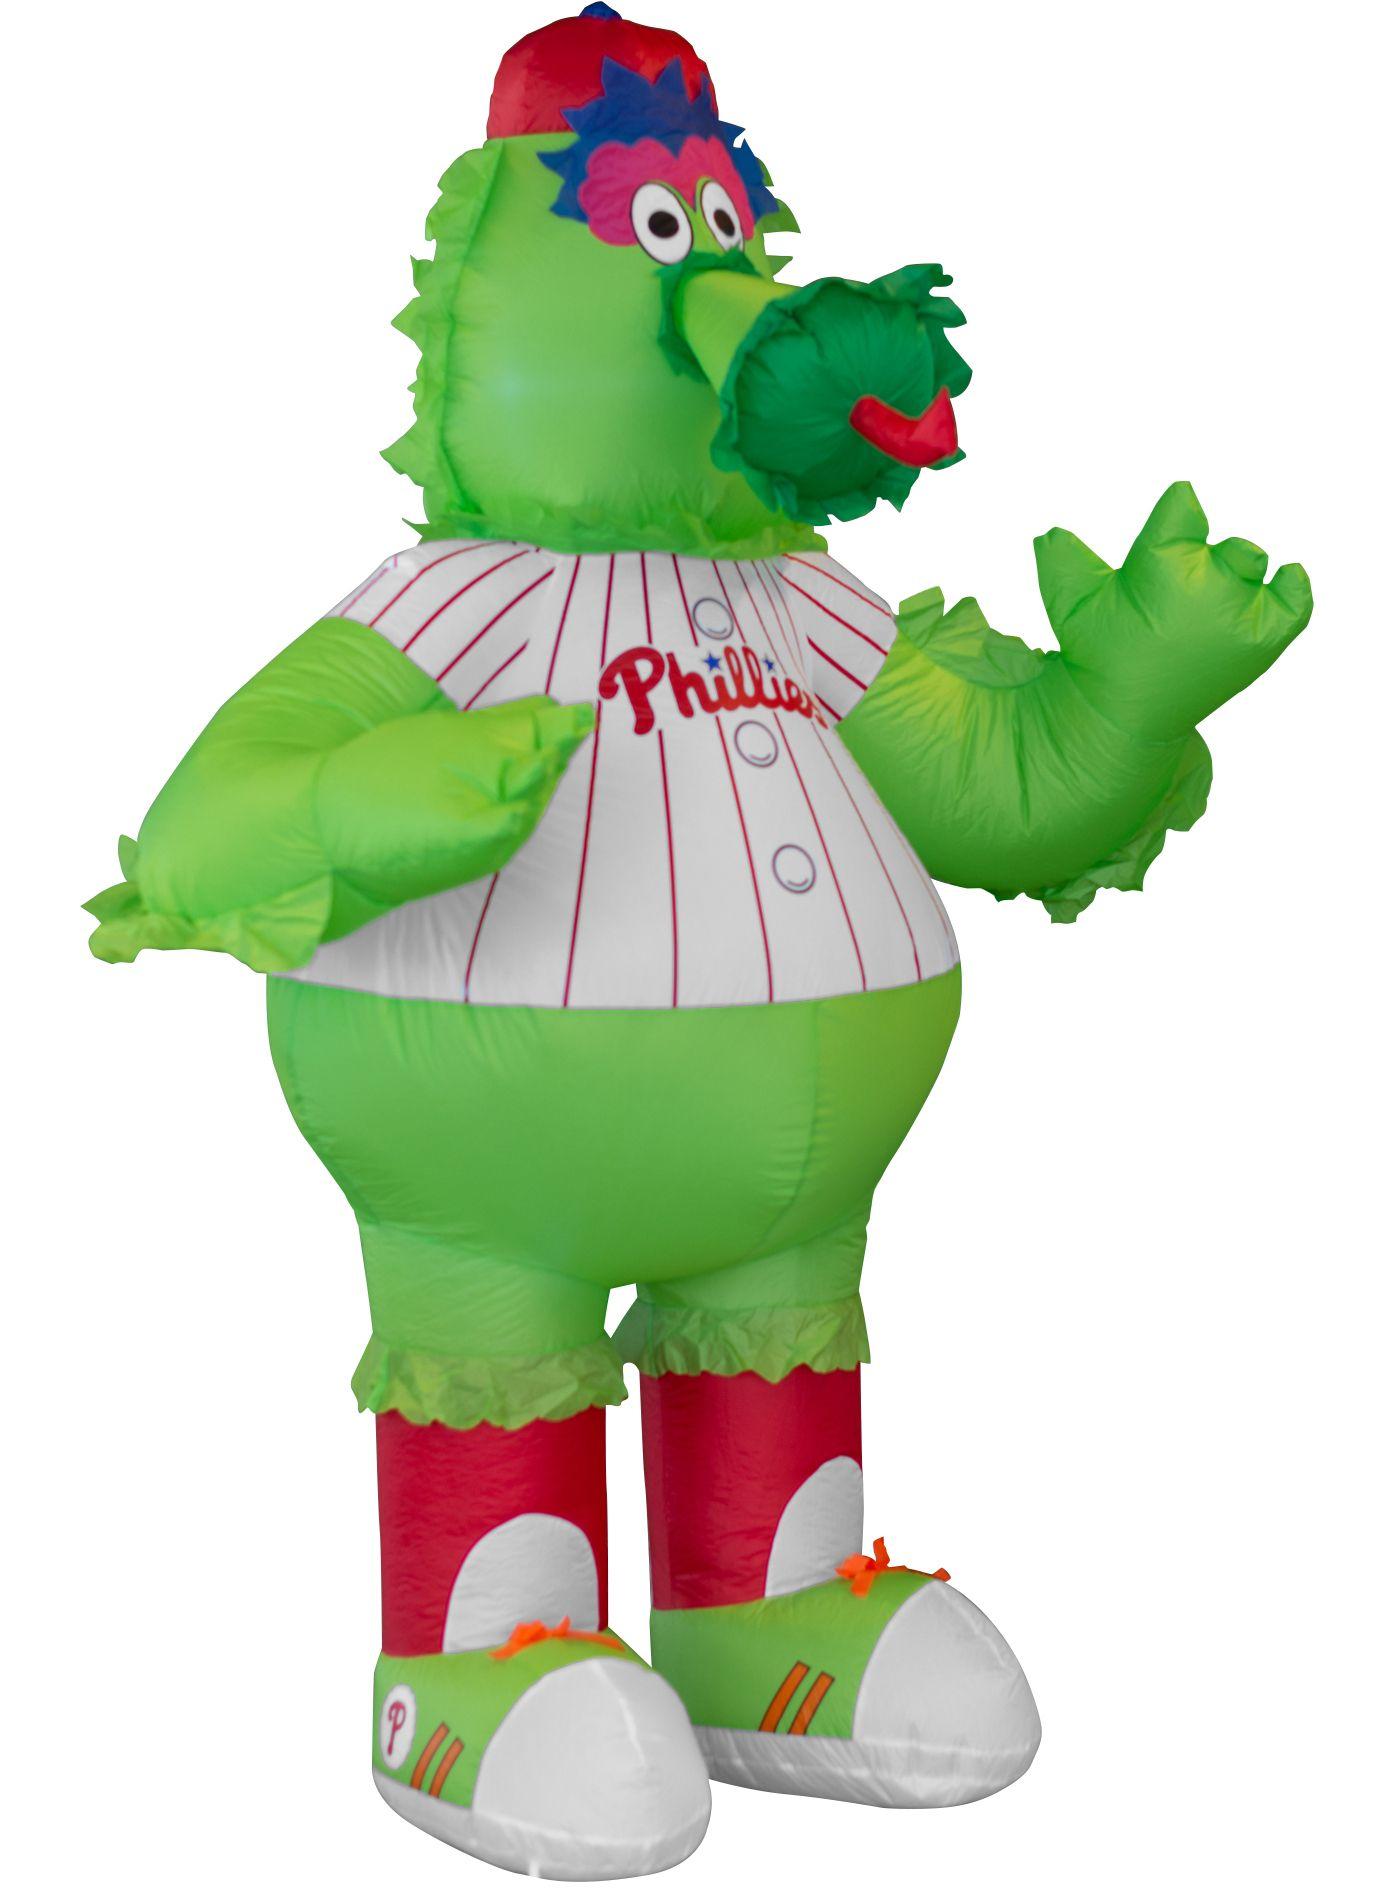 Boelter Philadelphia Phillies Inflatable Mascot